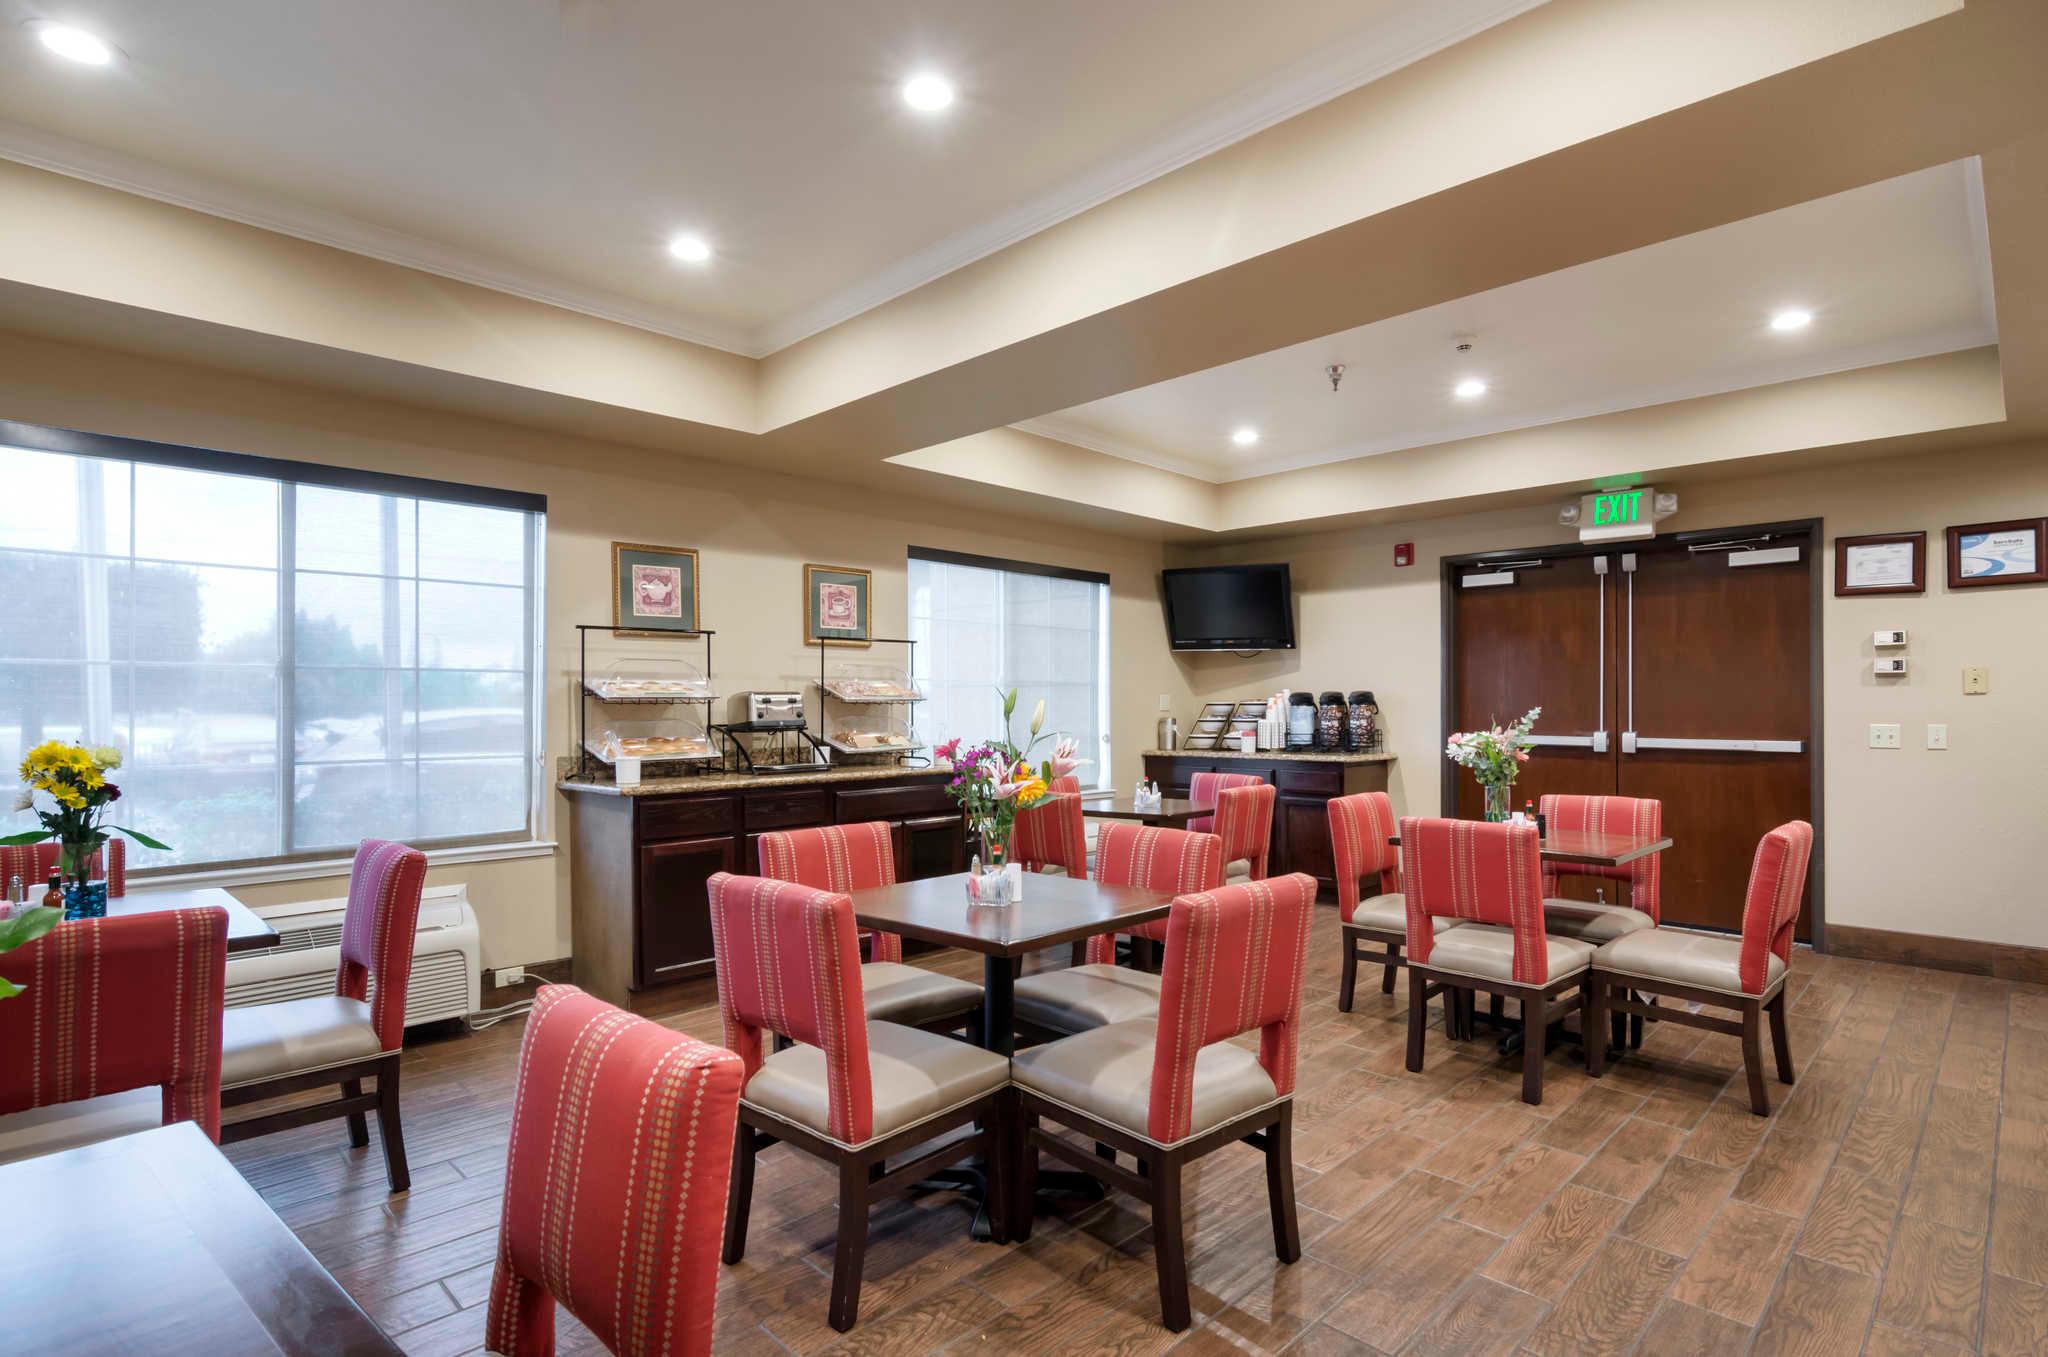 Comfort Inn & Suites Sacramento - University Area image 25